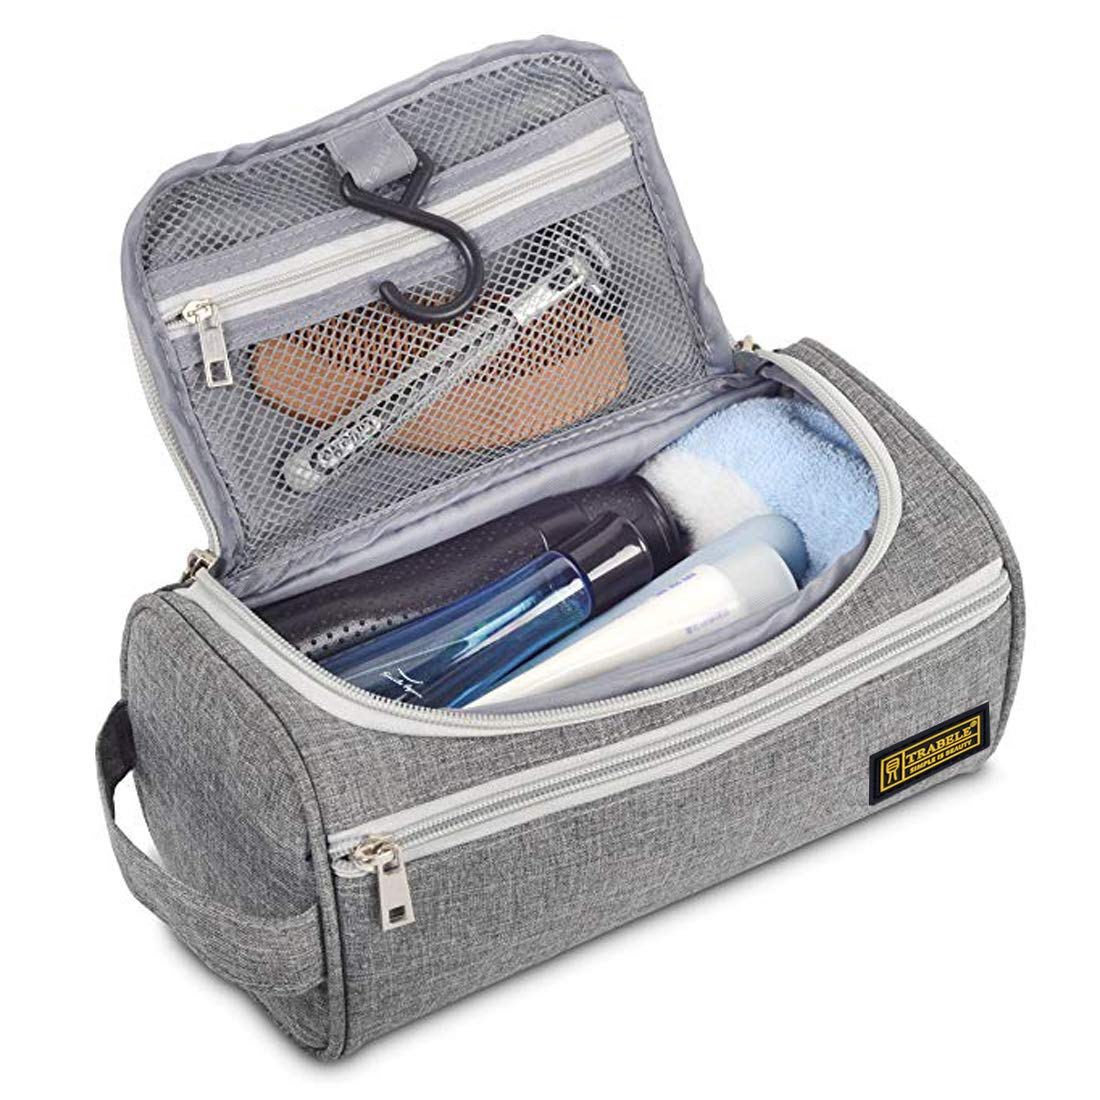 ZONBAR Kulturtasche Damen Kulturtasche Herren mit Kompaktes Design Wasserdicht